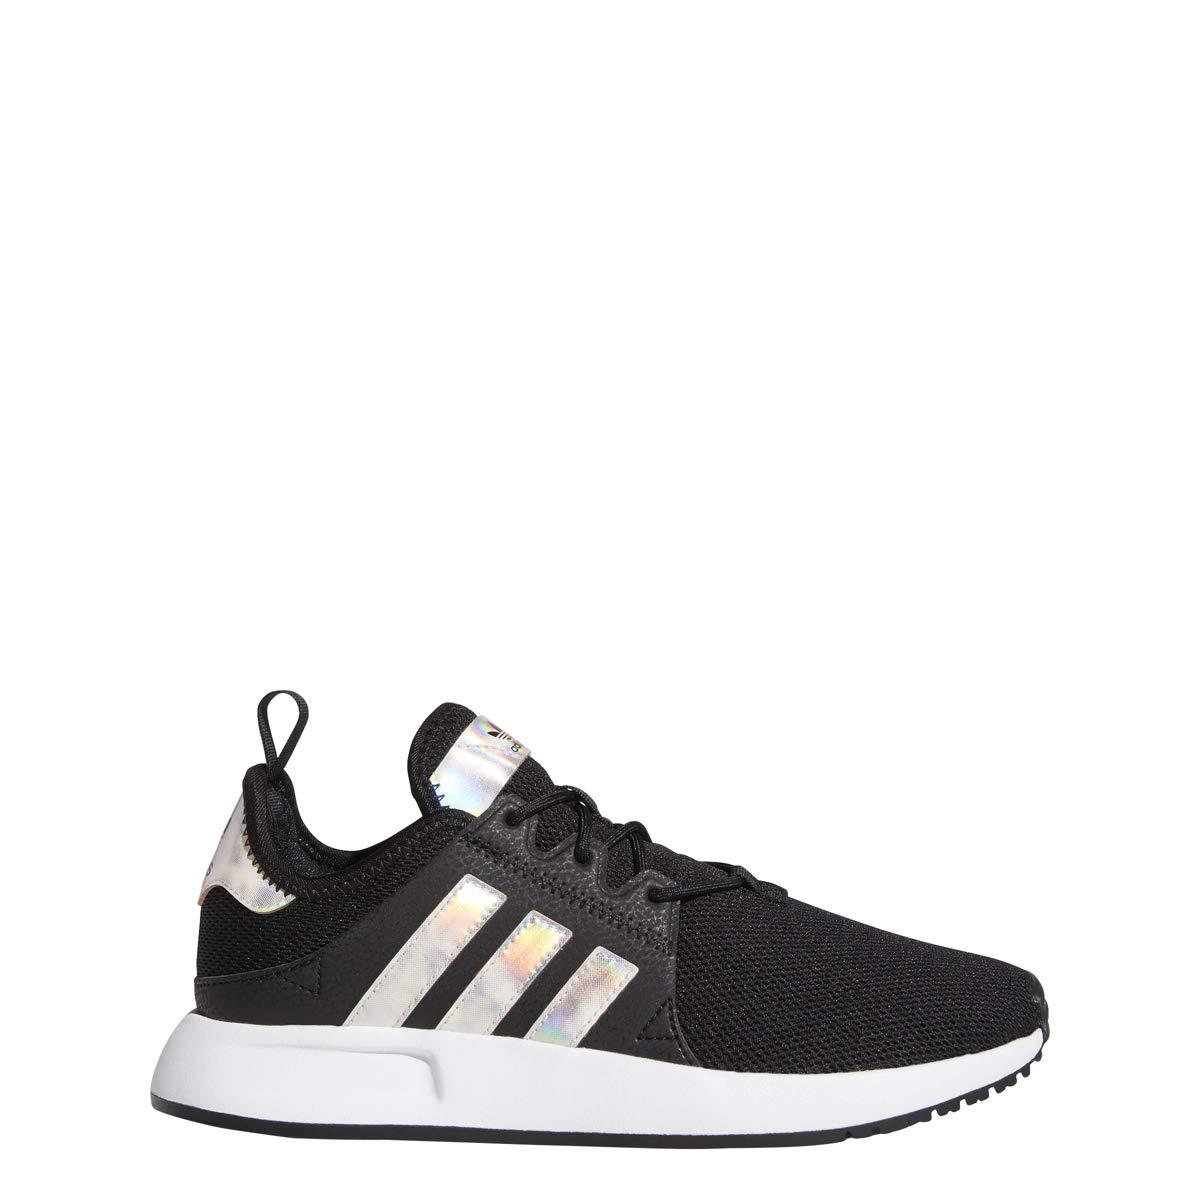 new style 13be5 7753e Amazon.com   adidas Girls X PLR J Sneaker (6 M US Big Kid, Blk Metallic)    Sneakers